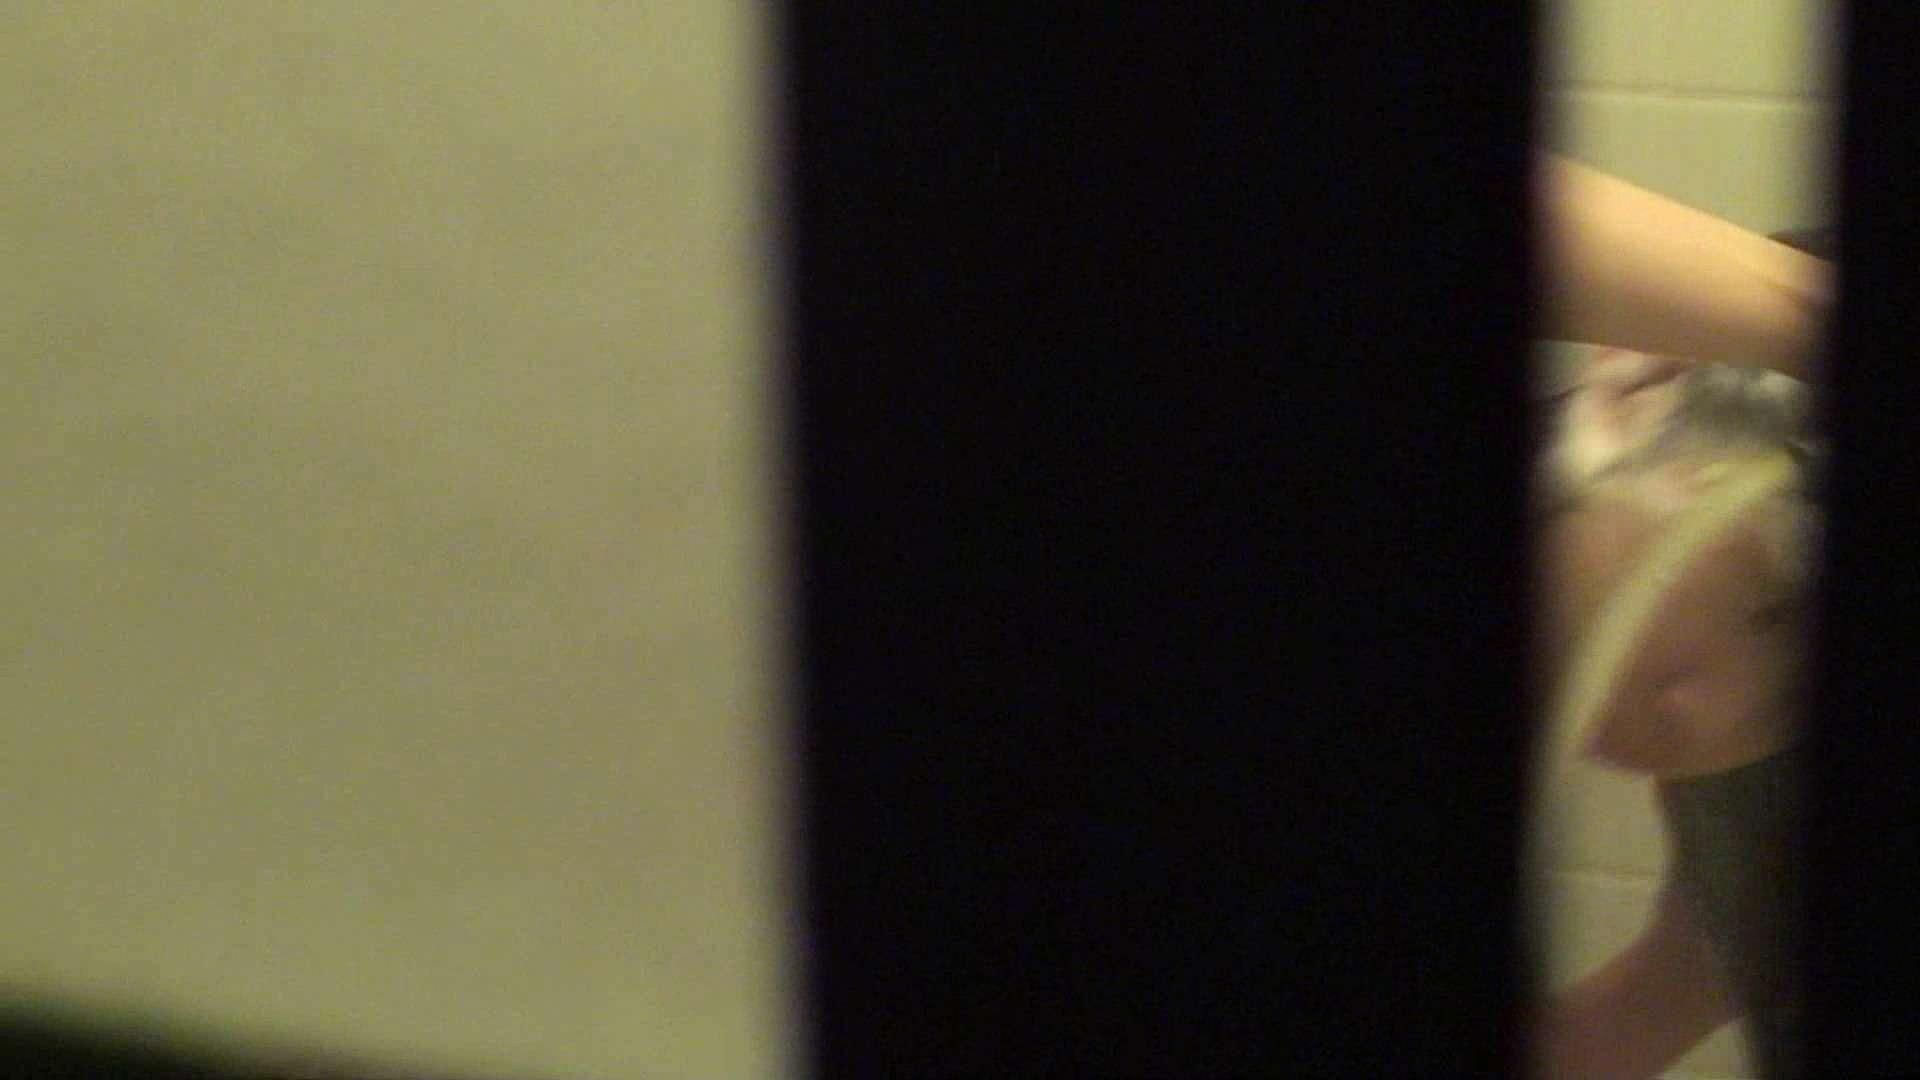 vol.02超可愛すぎる彼女の裸体をハイビジョンで!至近距離での眺め最高! 裸体 すけべAV動画紹介 78pic 22